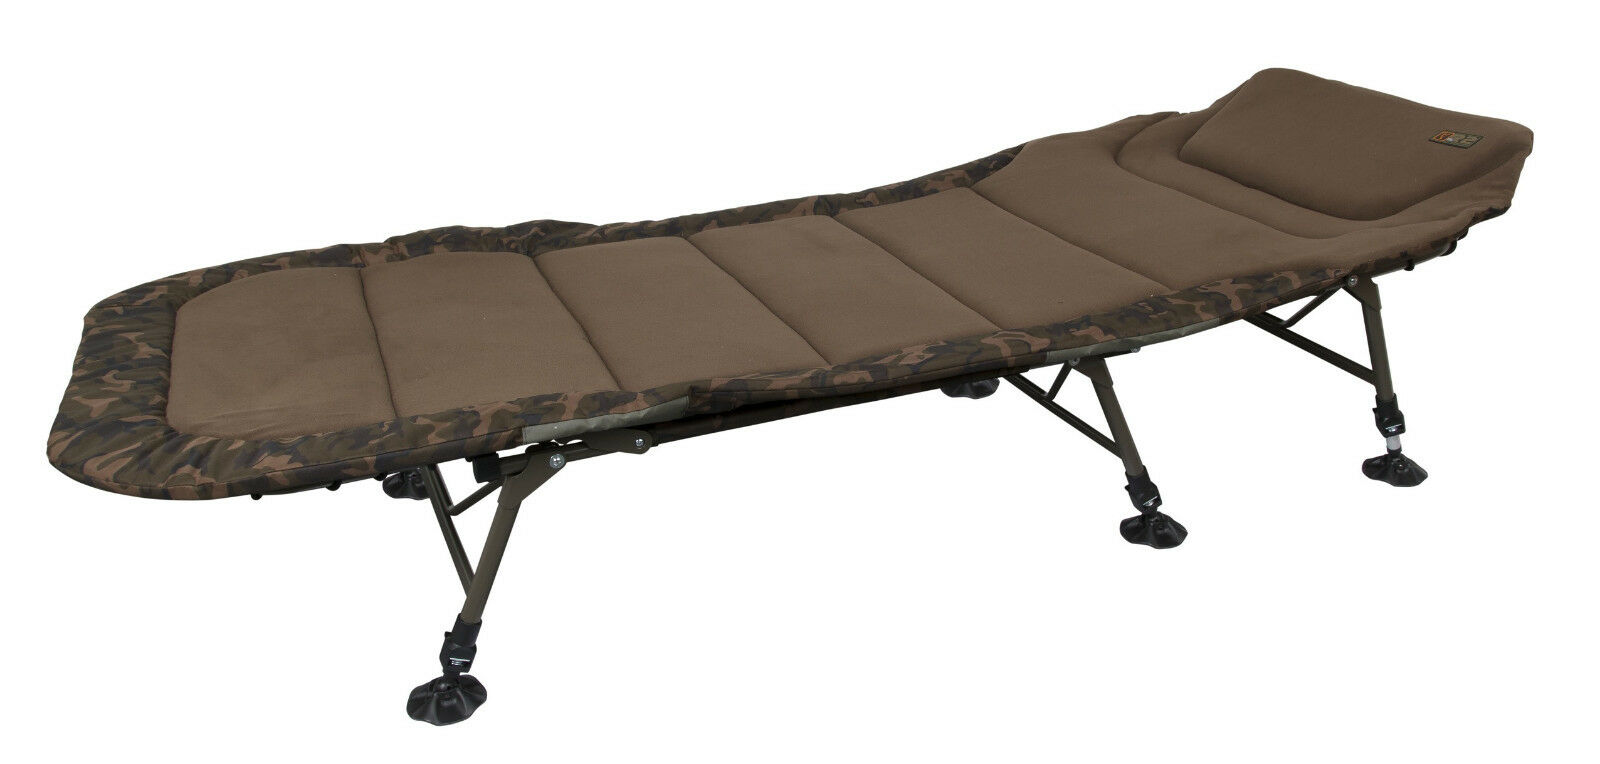 Fox R-series camo bedchair tumbona angel tumbona karpfenliege bed Chair